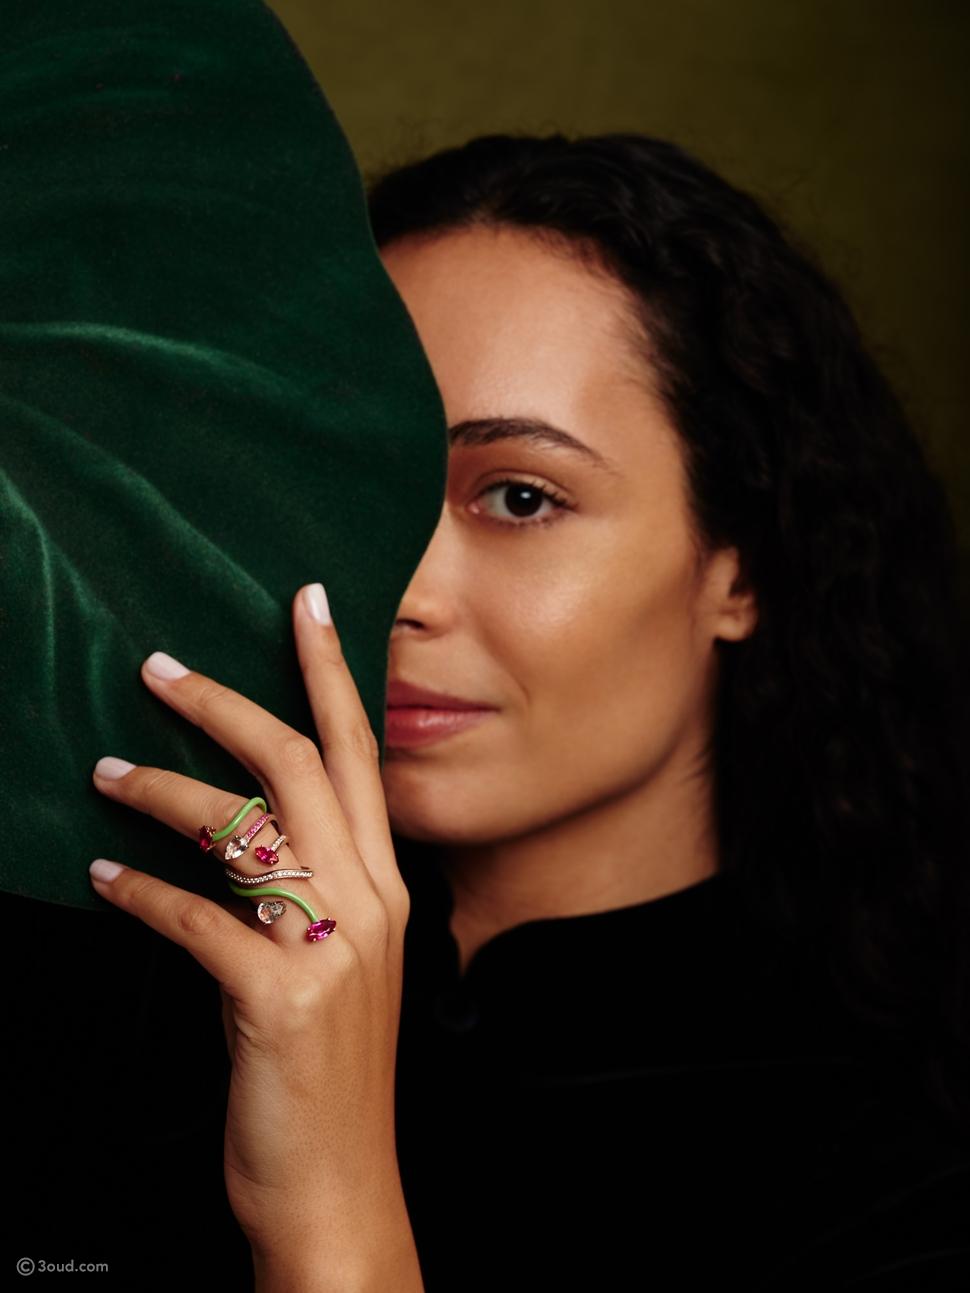 MATCHESFASHION تطلق علامات تجارية جديدة للمجوهرات